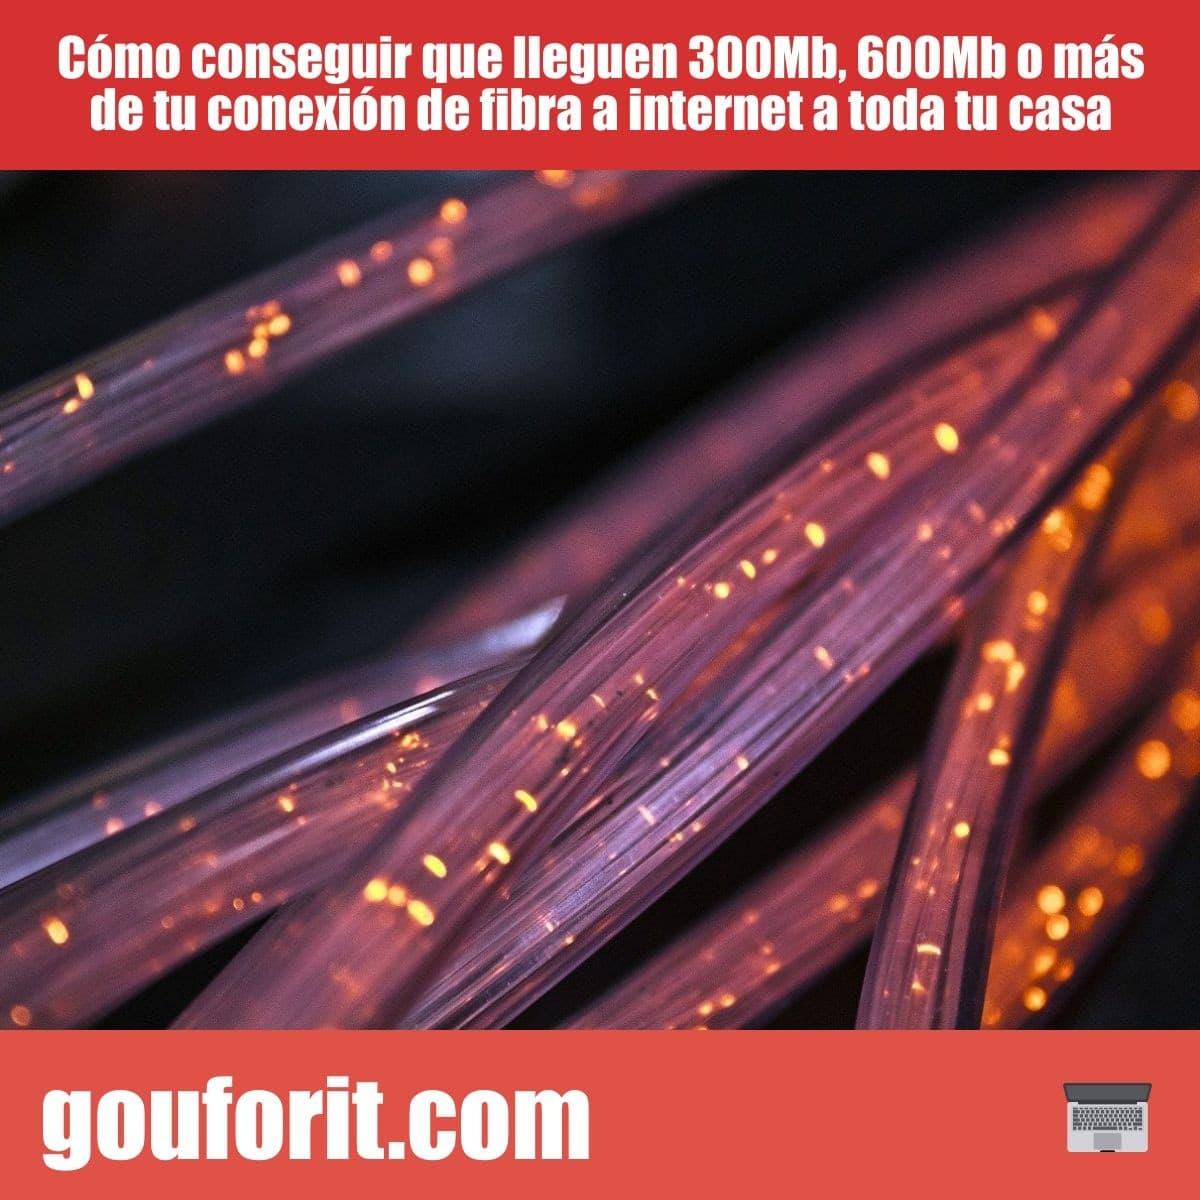 Cómo conseguir que lleguen 300Mb, 600Mb o más de tu conexión de fibra a internet a toda tu casa